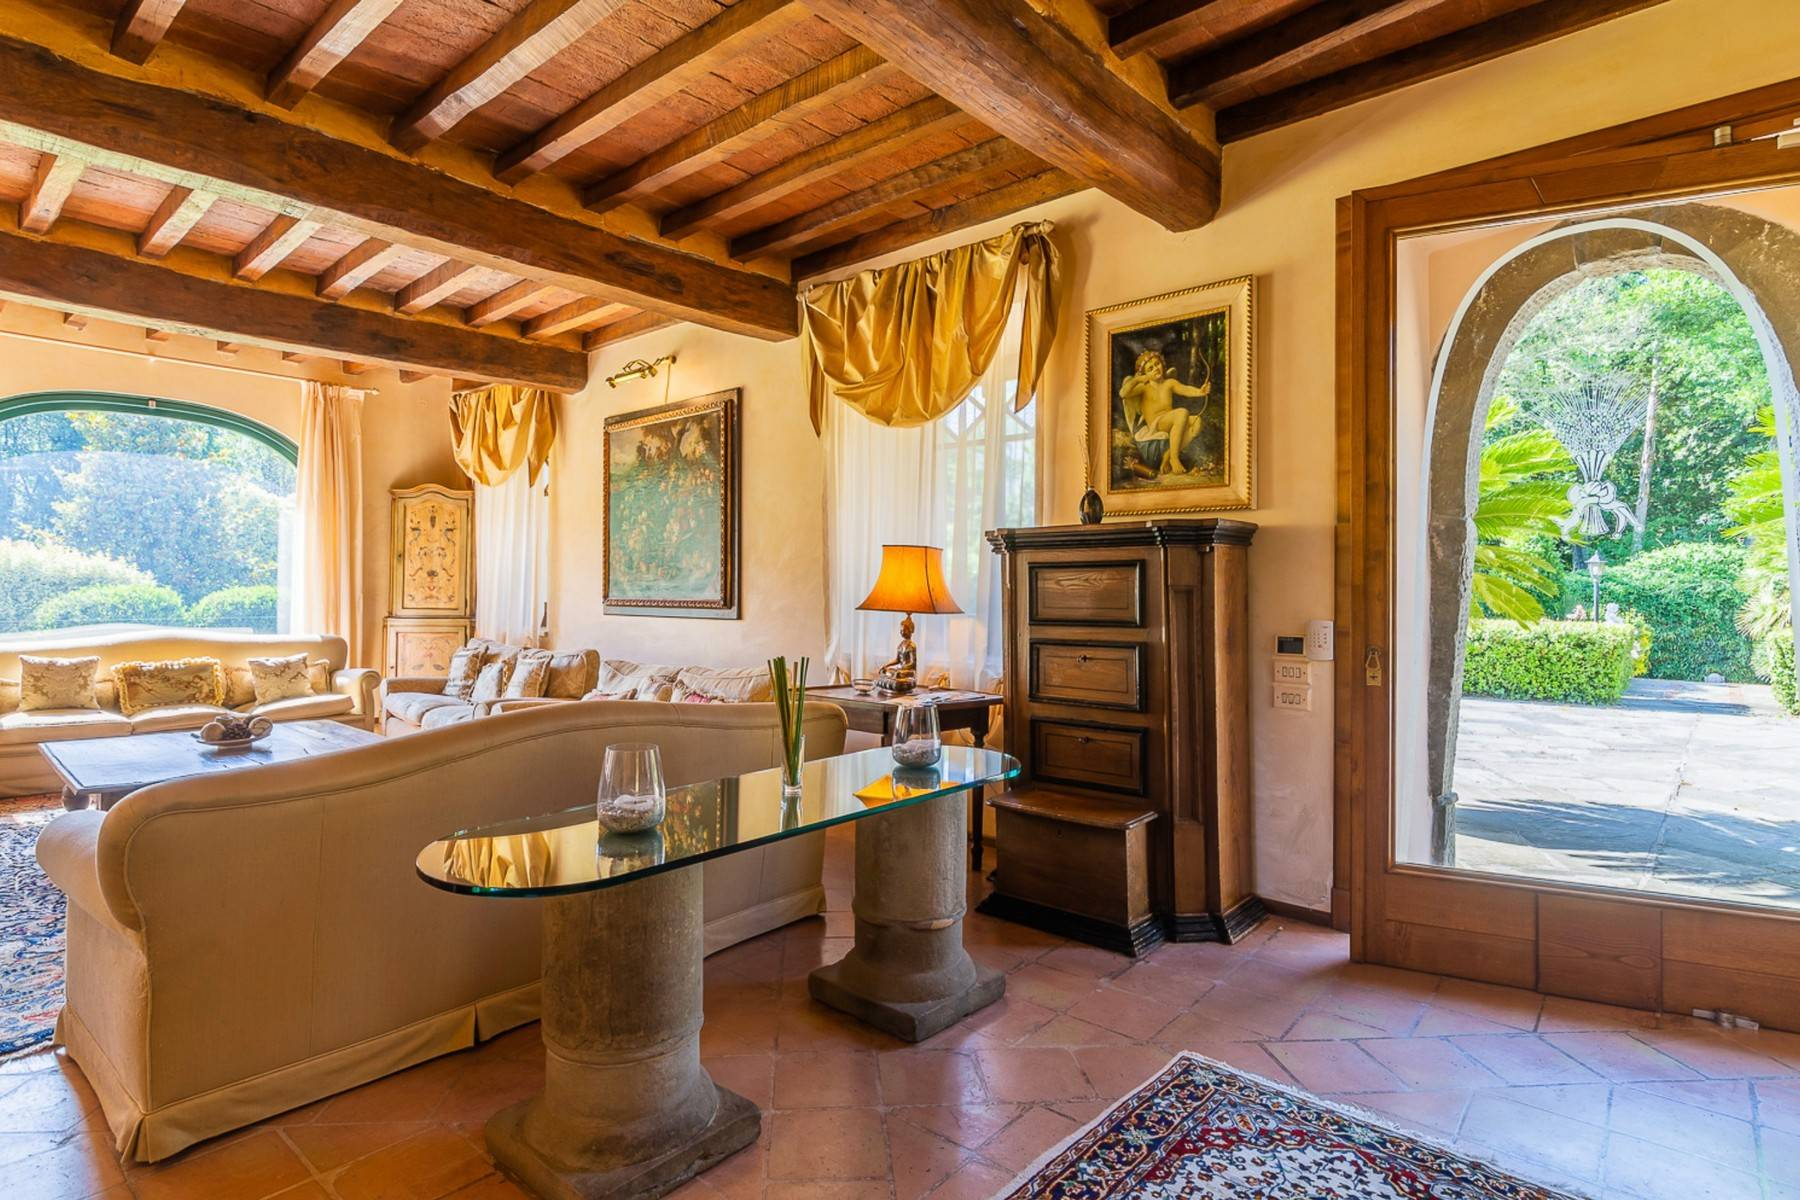 Villa in Vendita a Lucca: 5 locali, 1130 mq - Foto 16